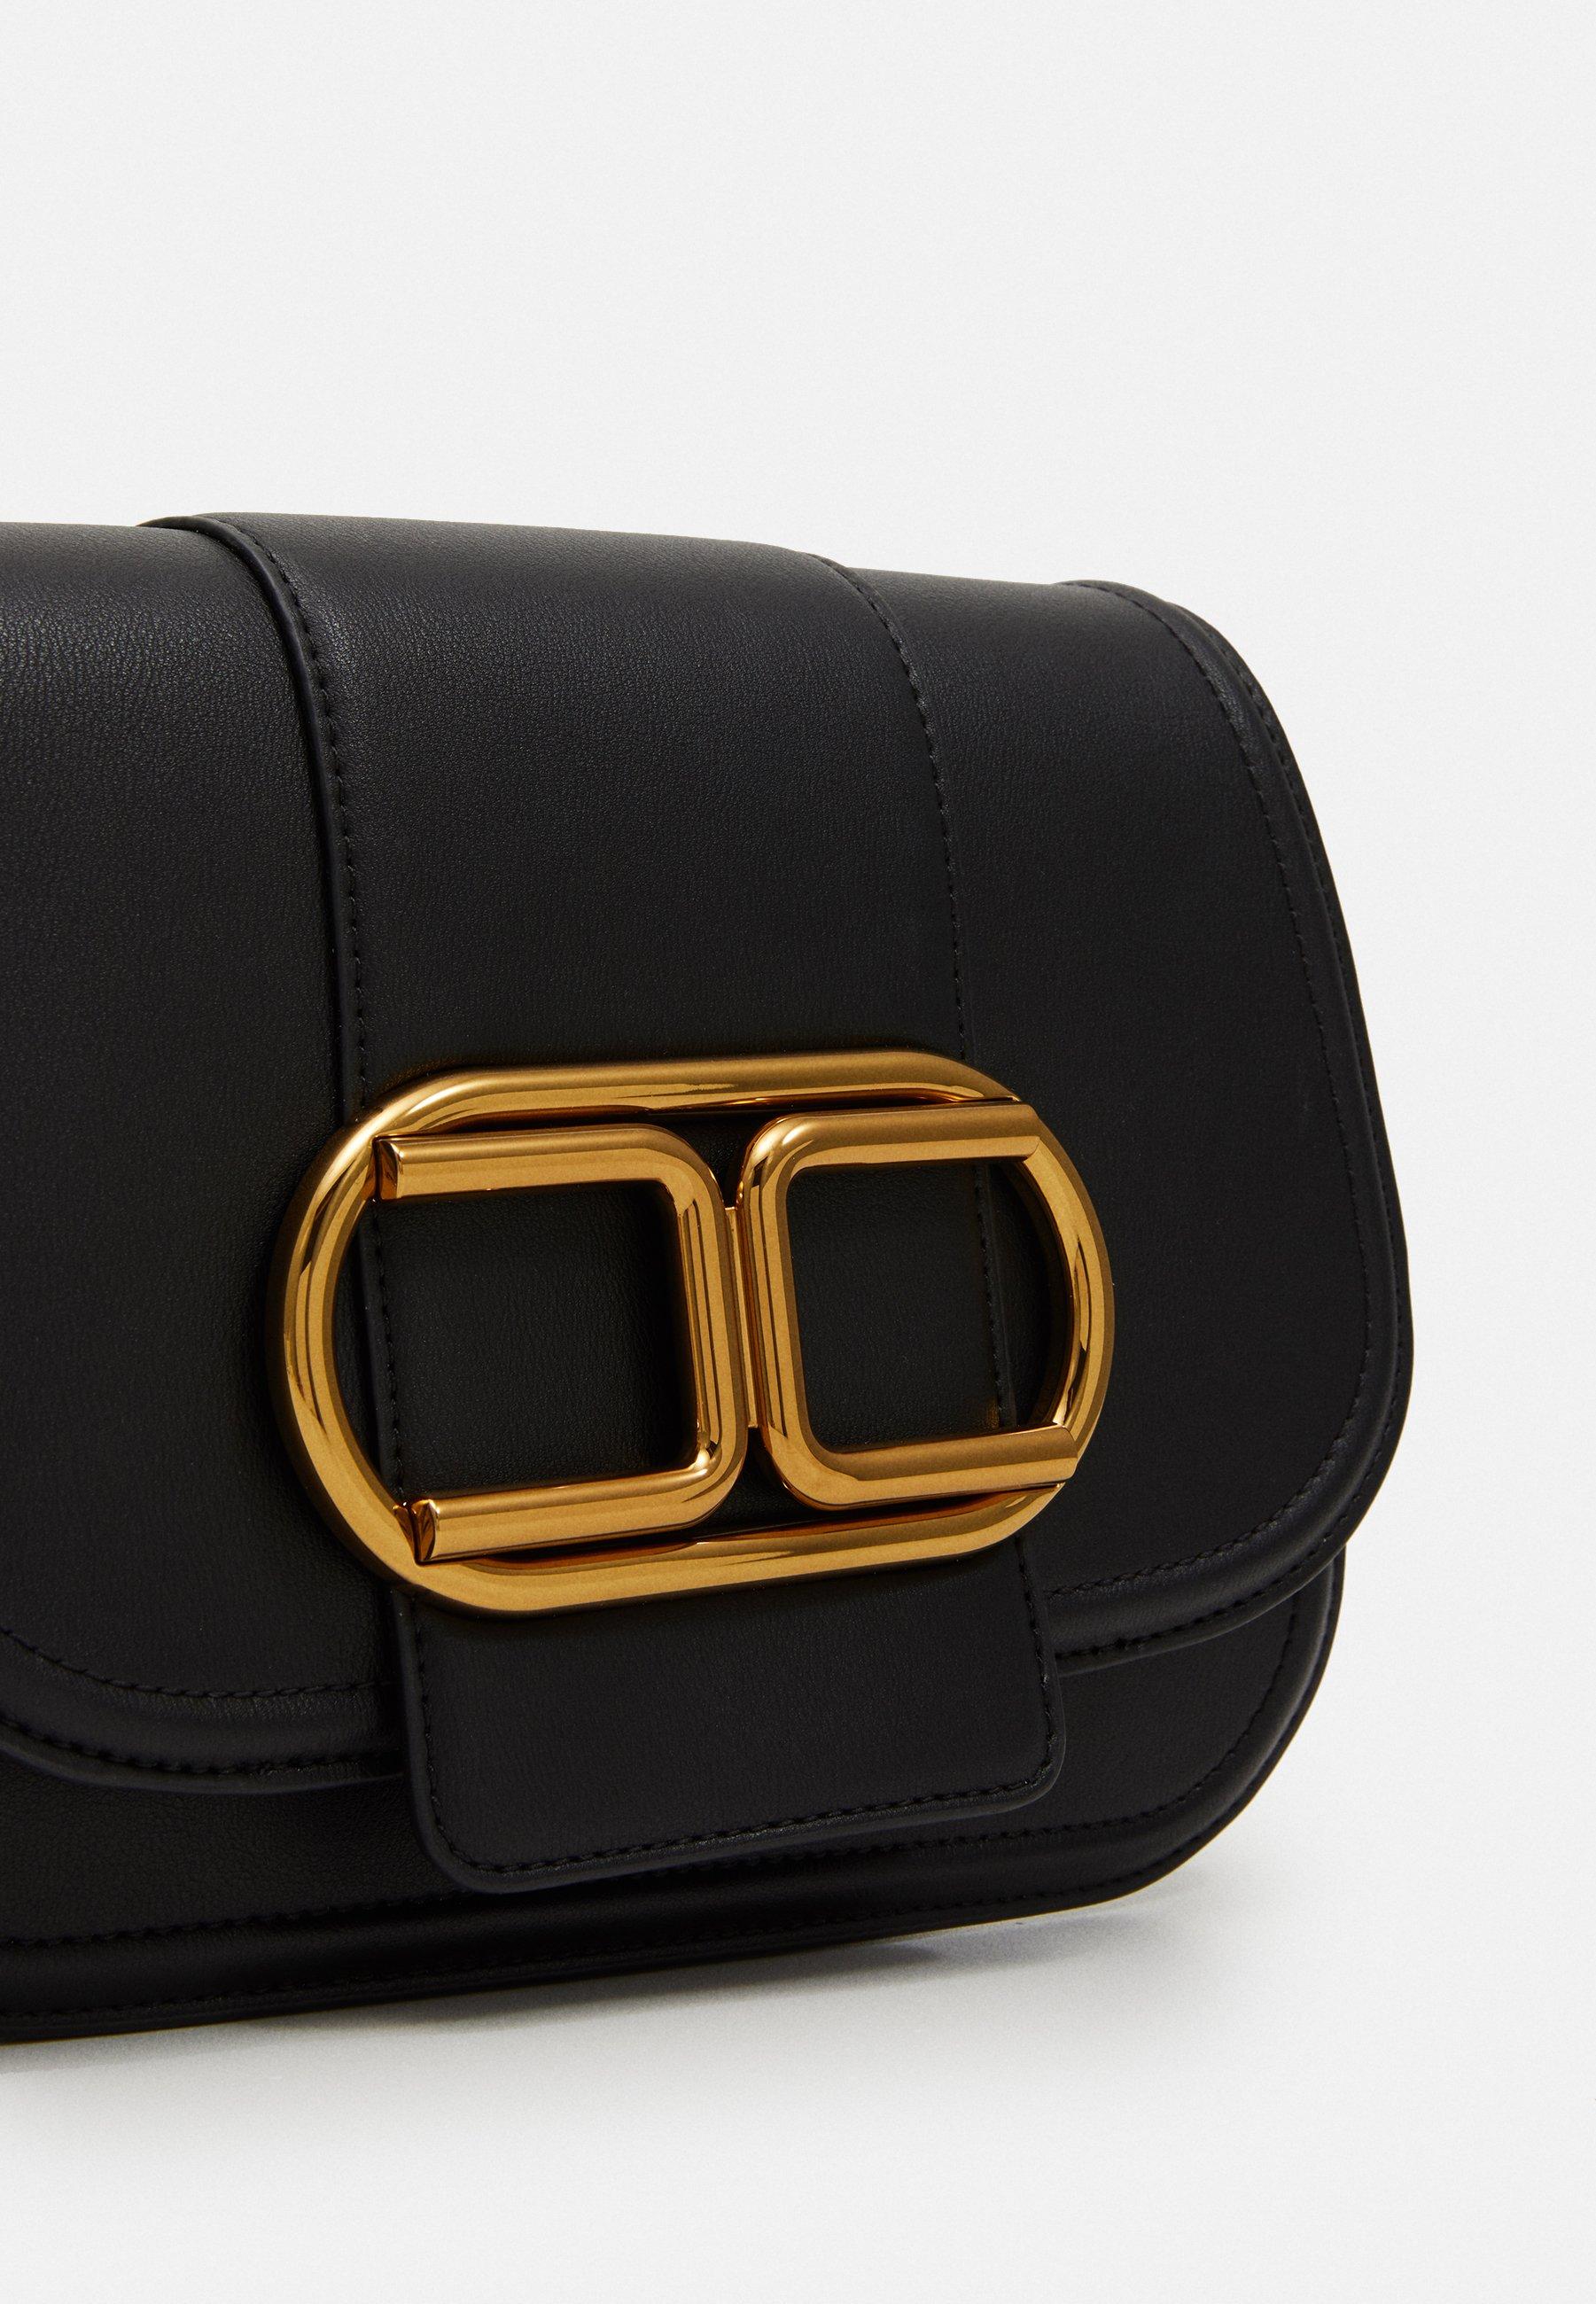 Shopping Accessories Elisabetta Franchi MED SADDLE LOGO CROSSBODY WITH CHAIN Across body bag nero Y7SQX36gk